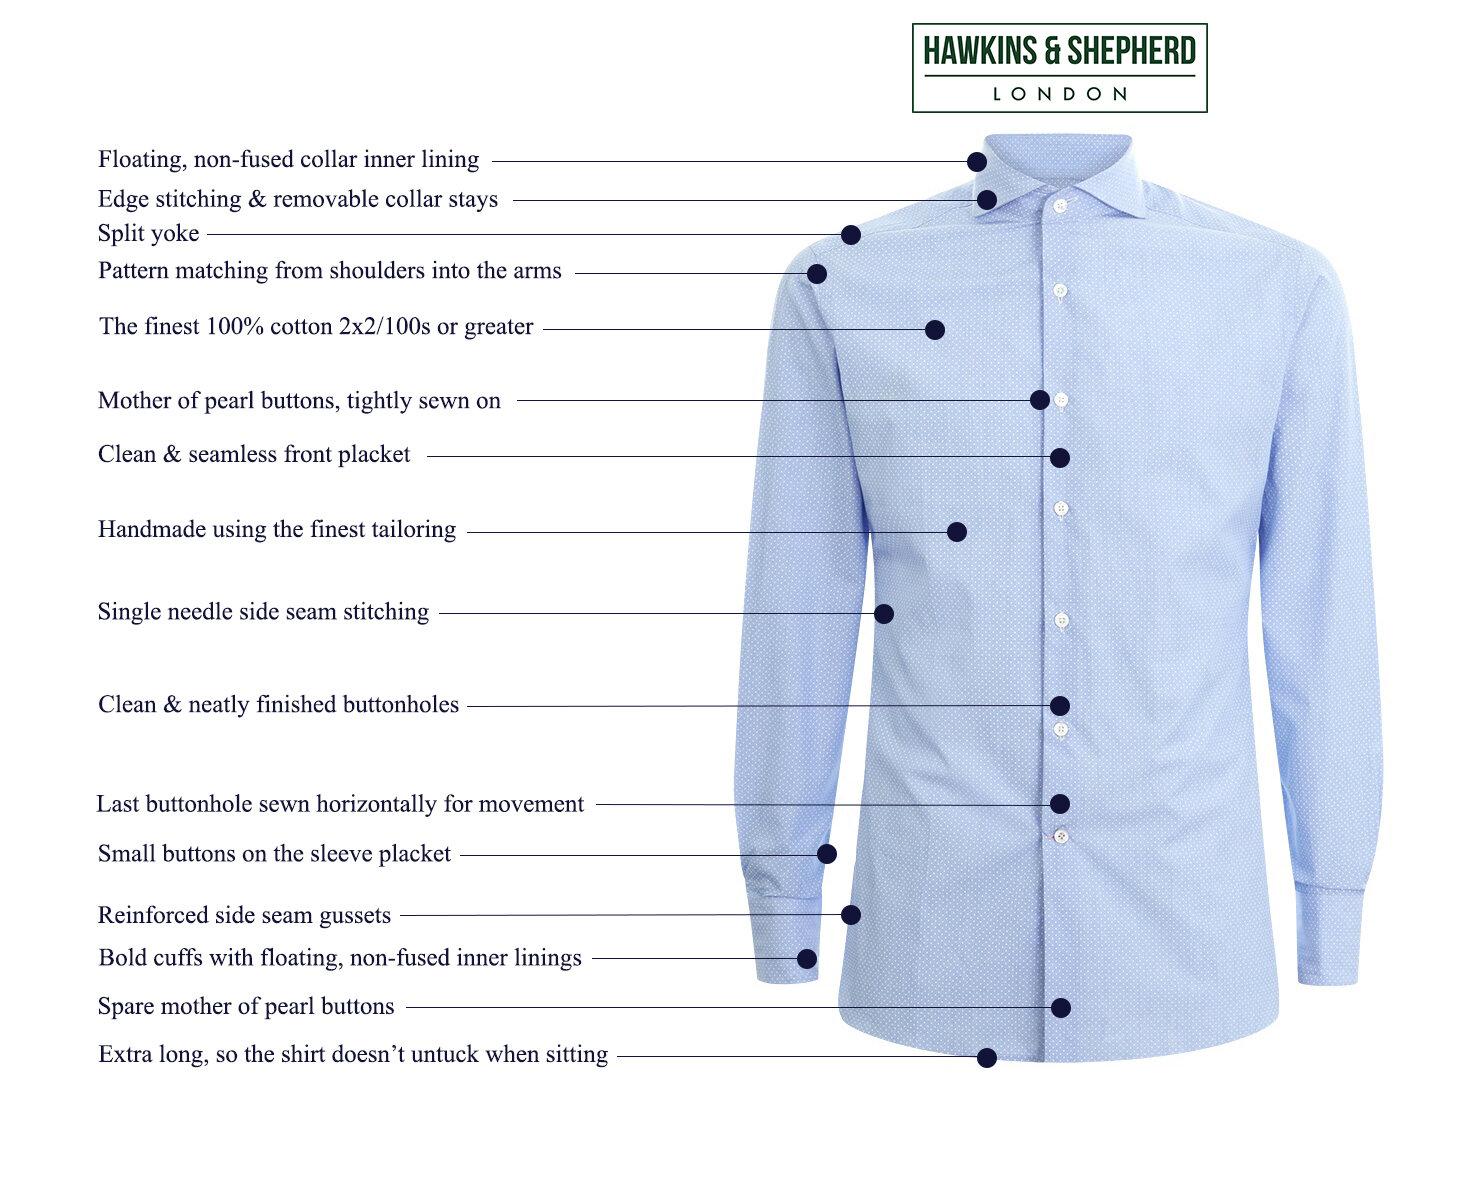 The Perfect Shirt by Hawkins & Shepherd.jpg